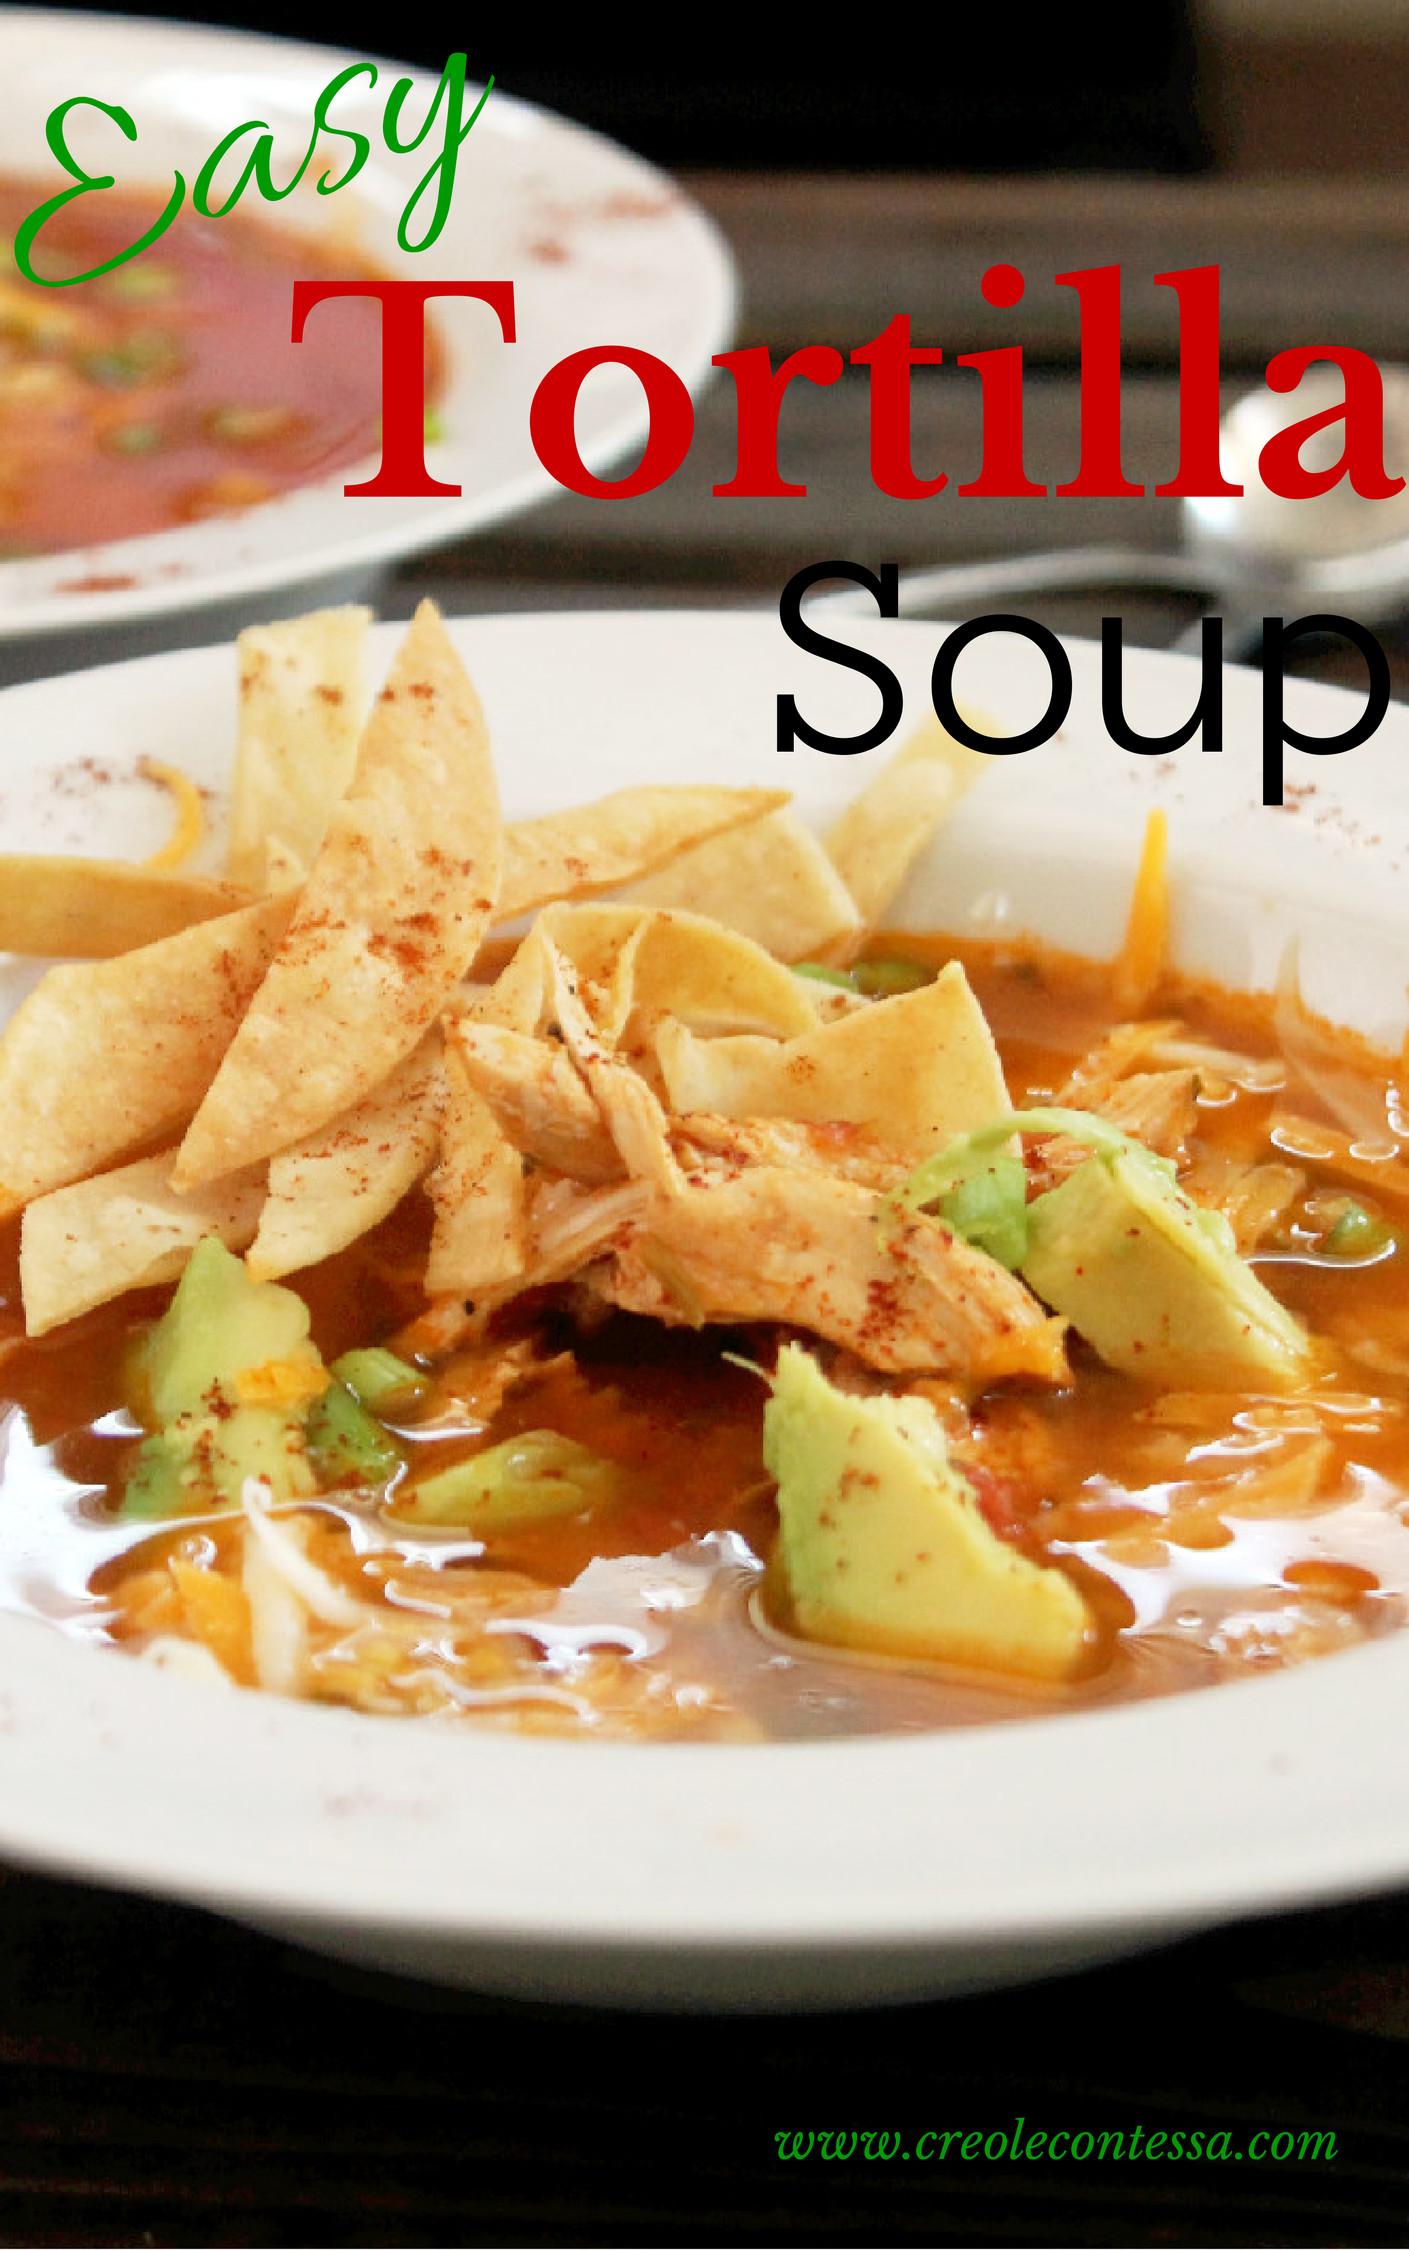 Quick and Easy Chicken Tortilla Soup-Creole Contessa